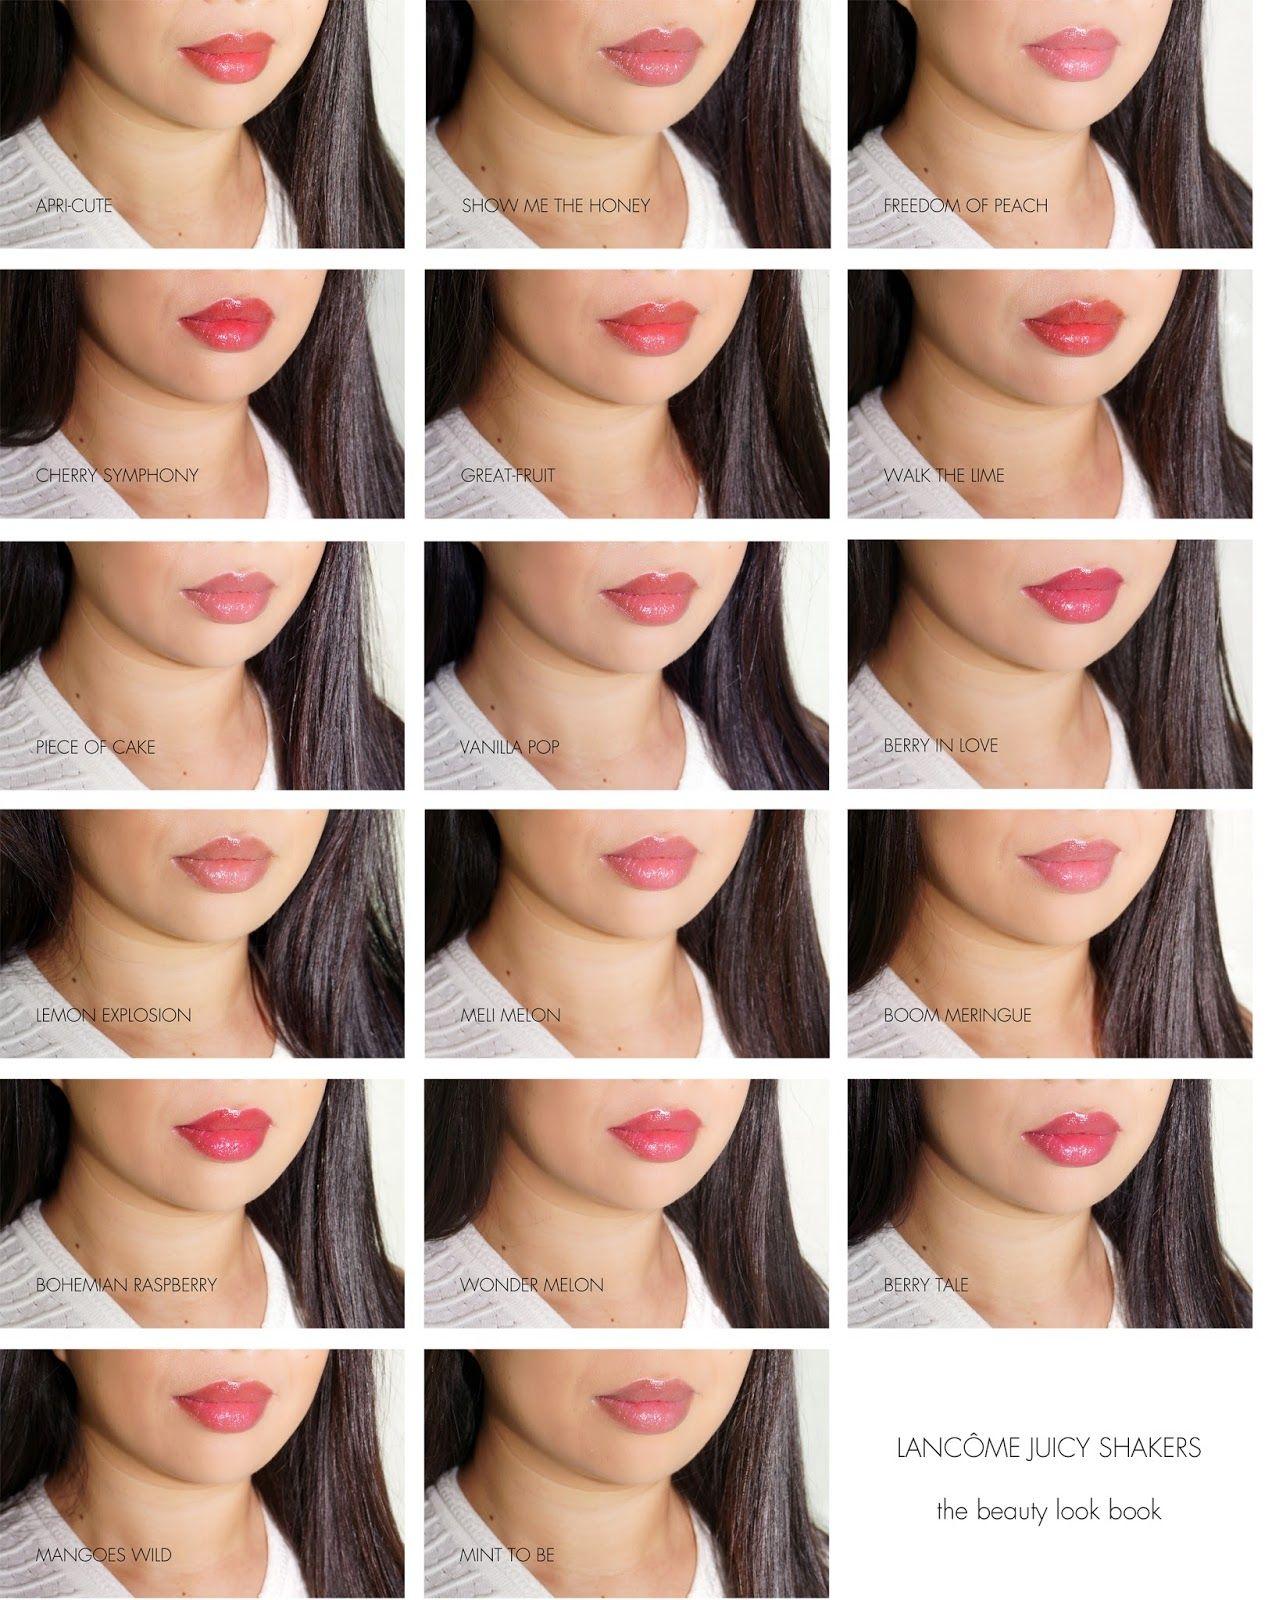 Lancome Juicy Shaker Pigment Infused Bi Phase Lip Oil Trish McEvoy Beauty Booster Lip Balm SPF15 0.20oz (5.67g)